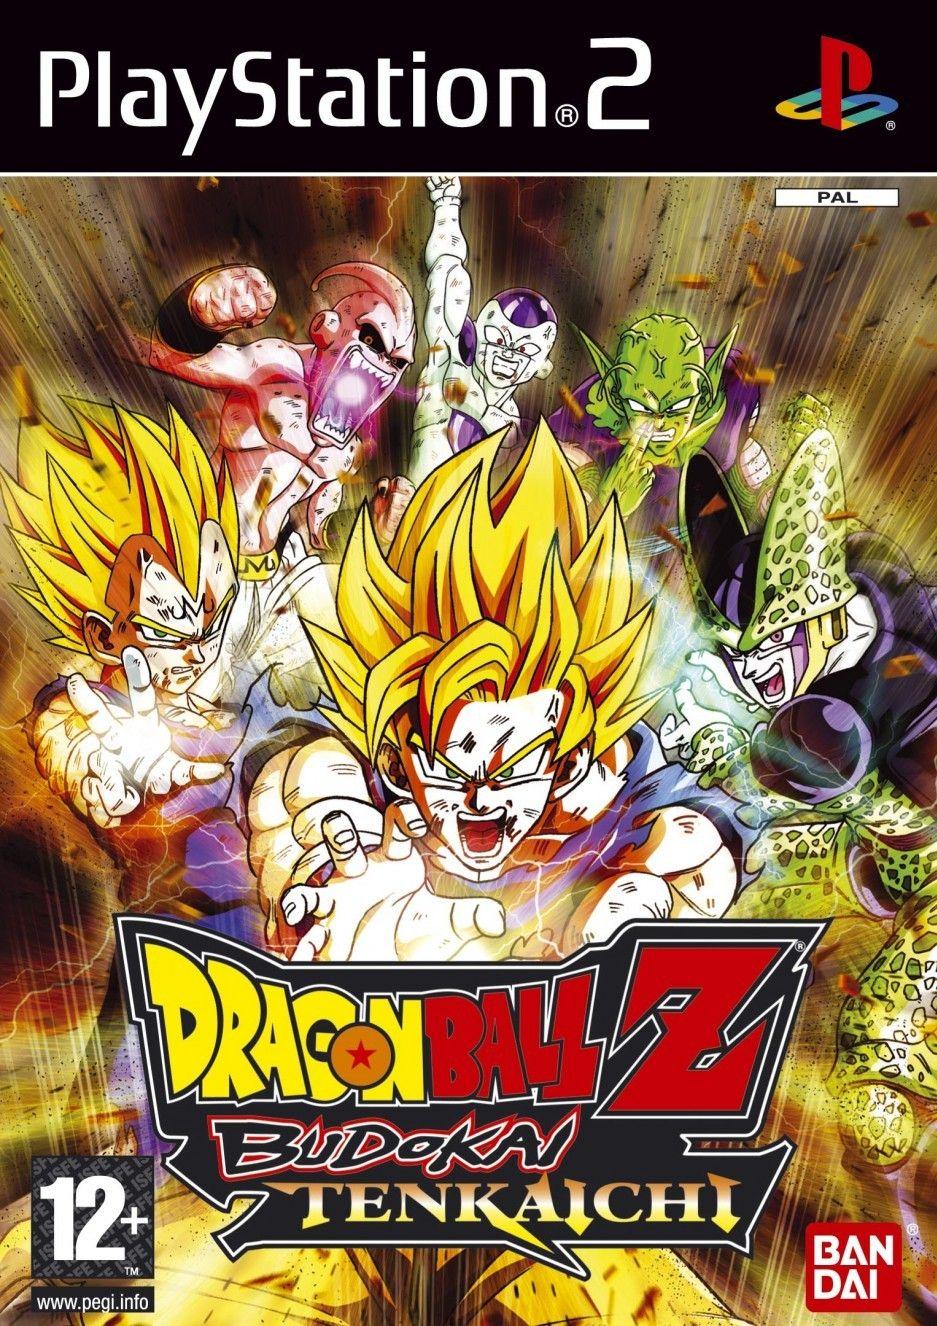 Dragon Ball Z Budokai Tenkaichi Sony Playstation 2 Dragones Dragon Ball Z Playstation 2